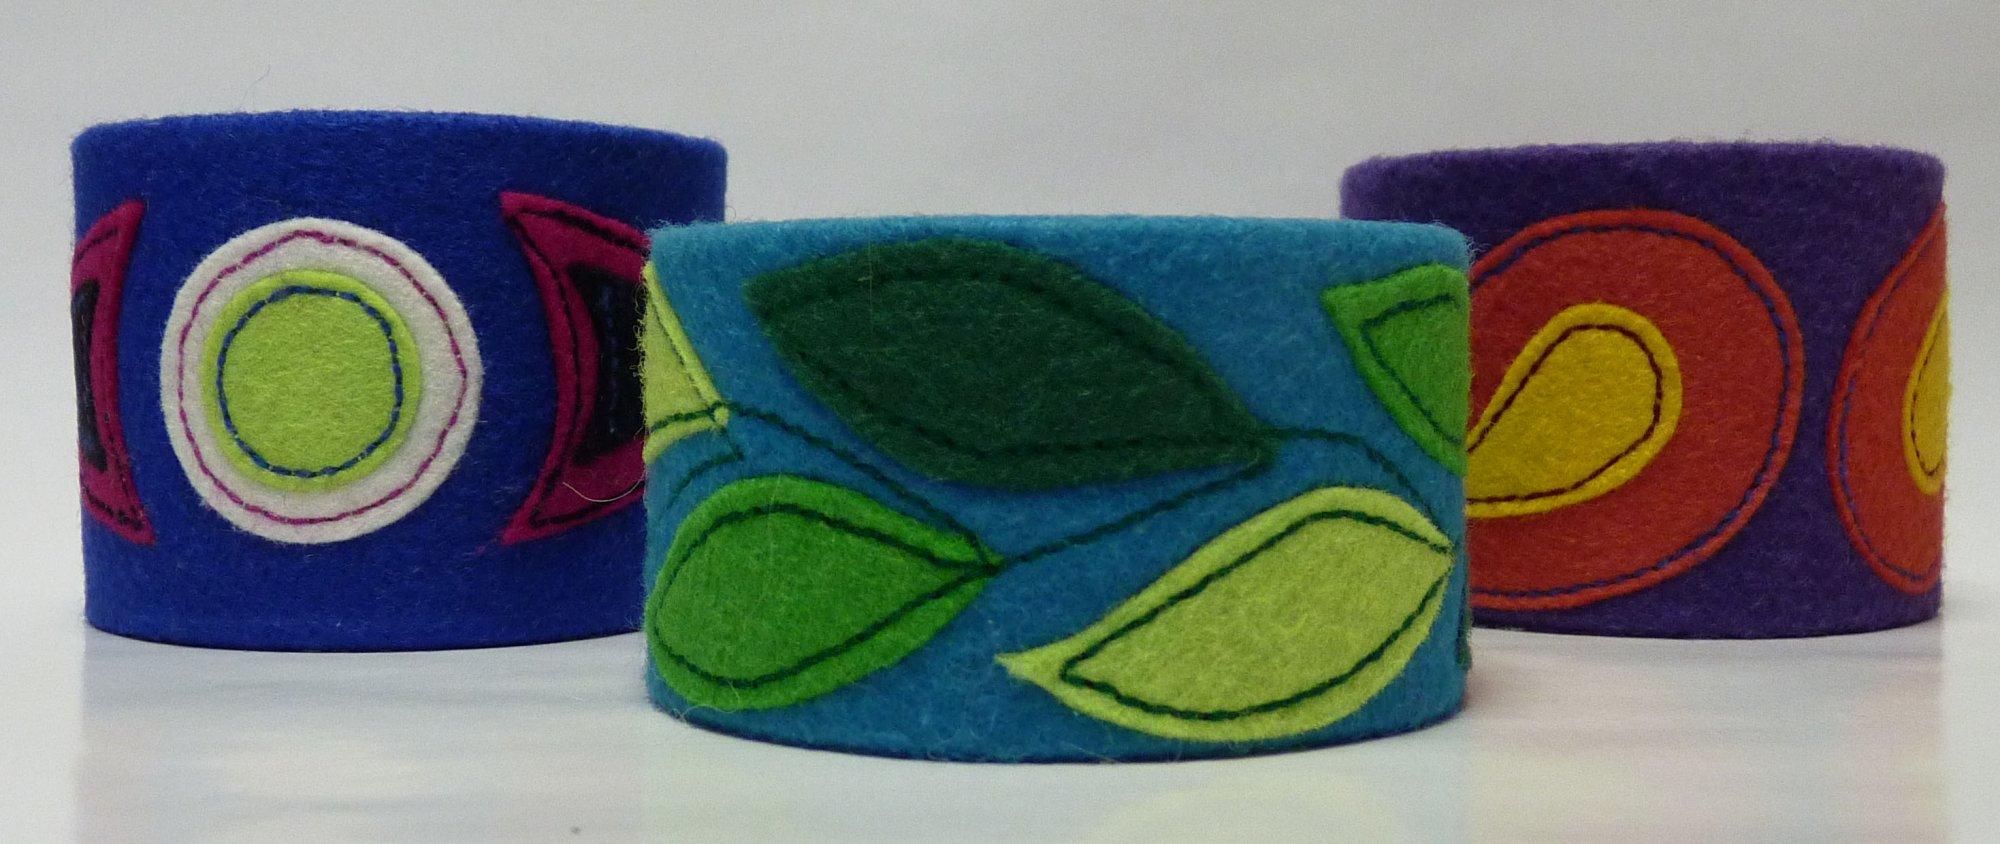 Boho Bracelets- Retiring 1/31/19